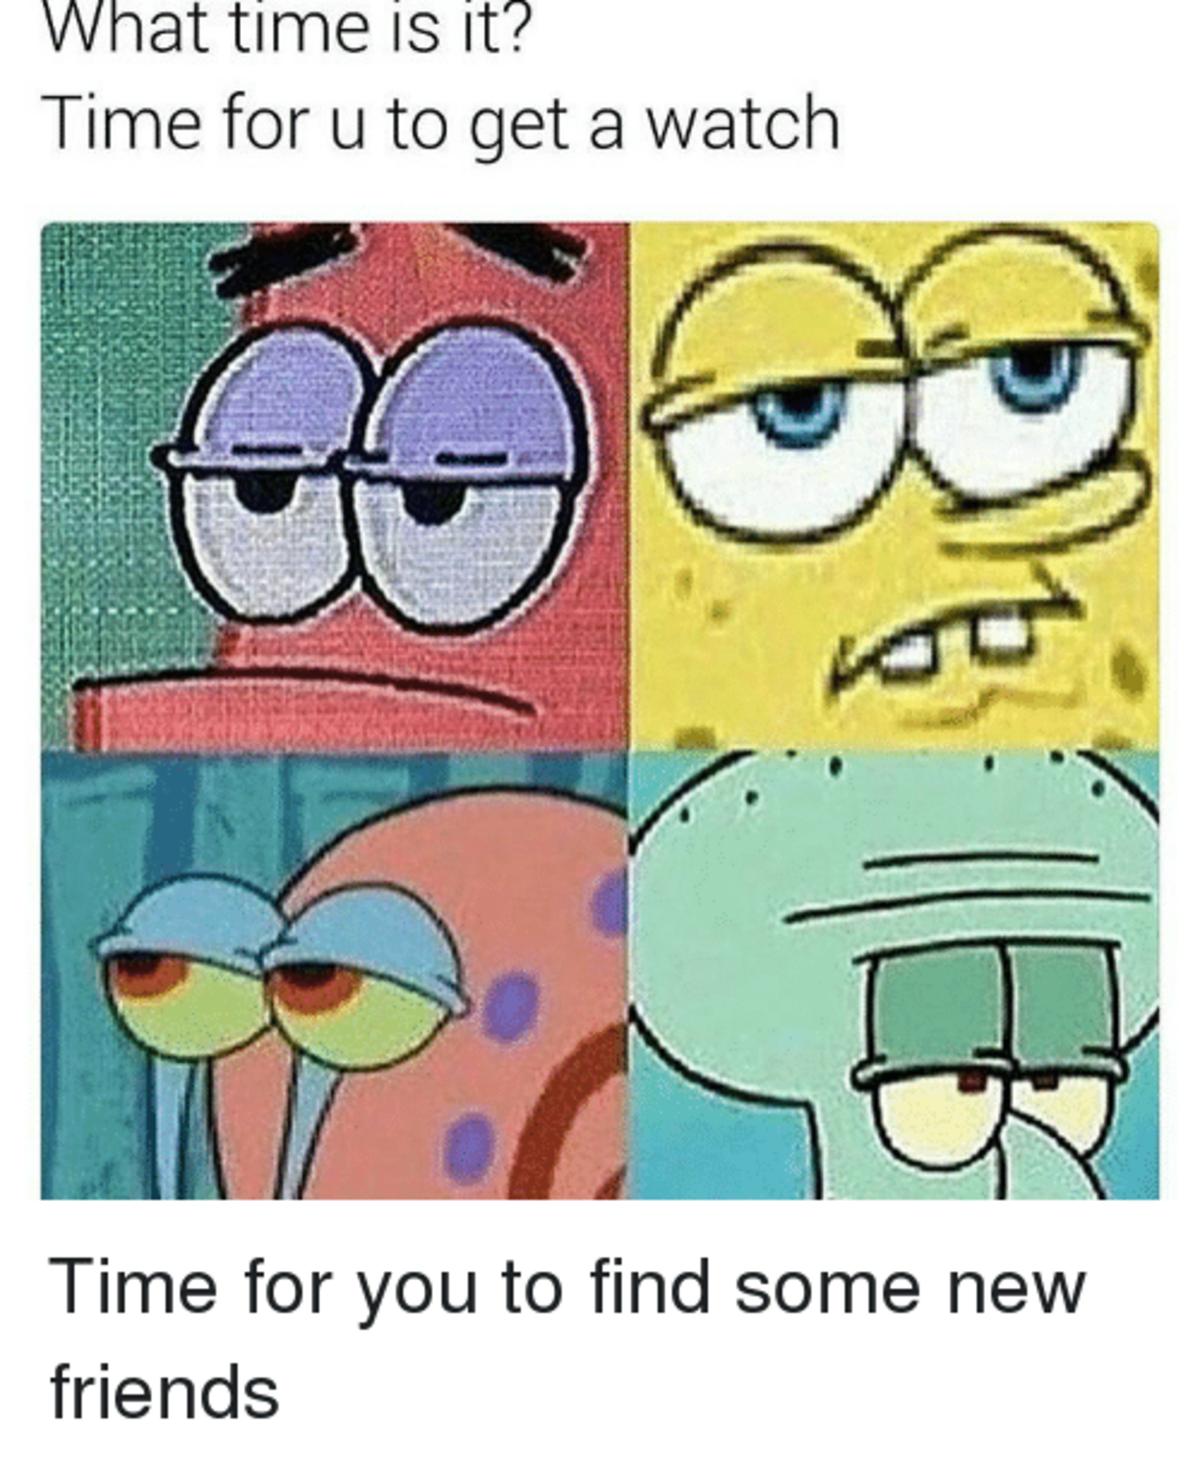 7bc966dbb0f2 Spongebob glasses meme png 1200x1464 Spongebob glasses meme